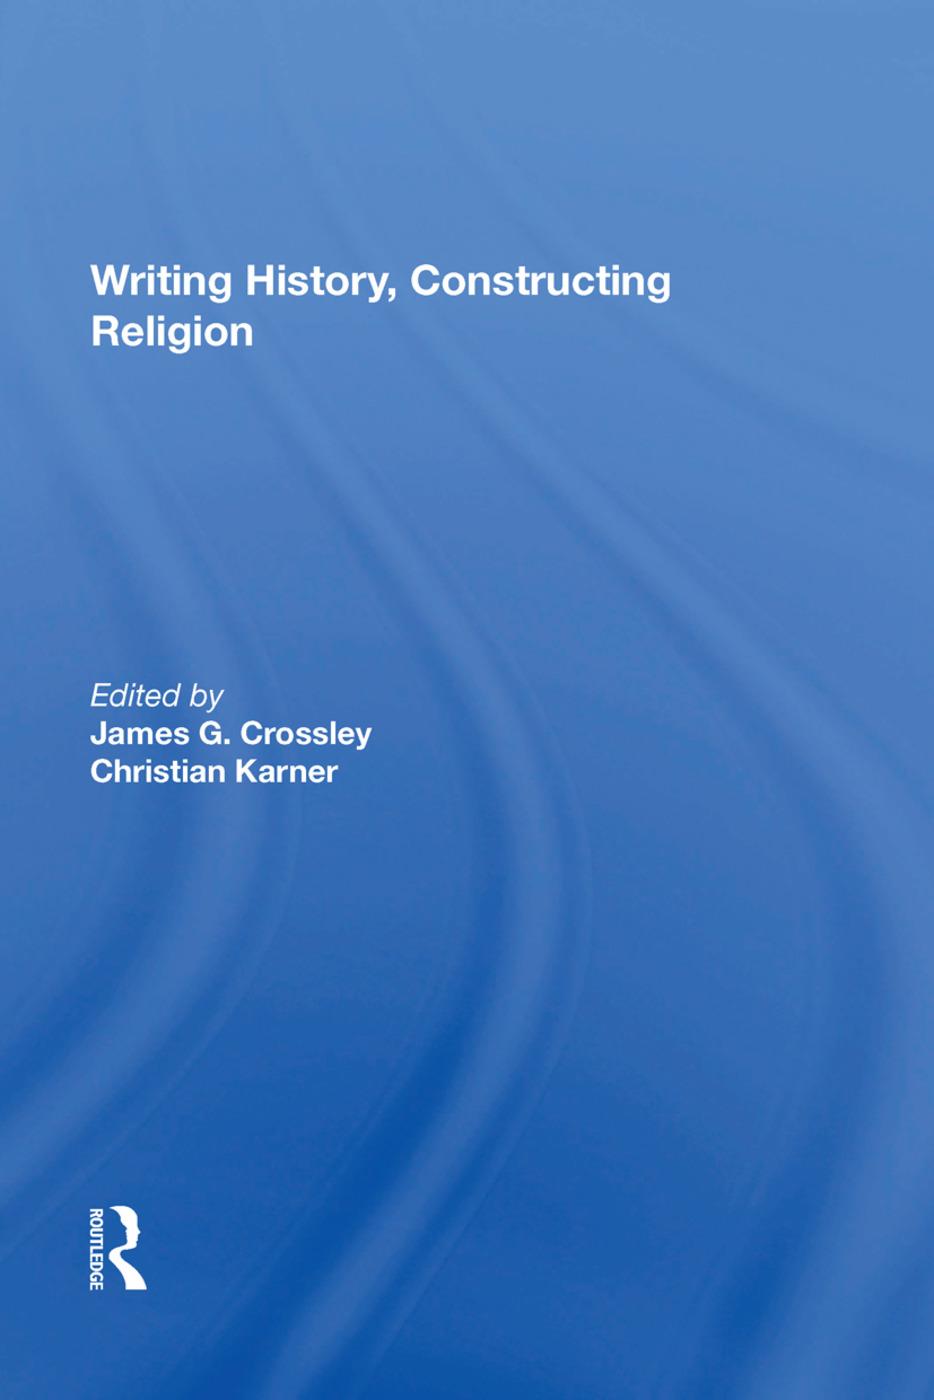 Writing History, Constructing Religion